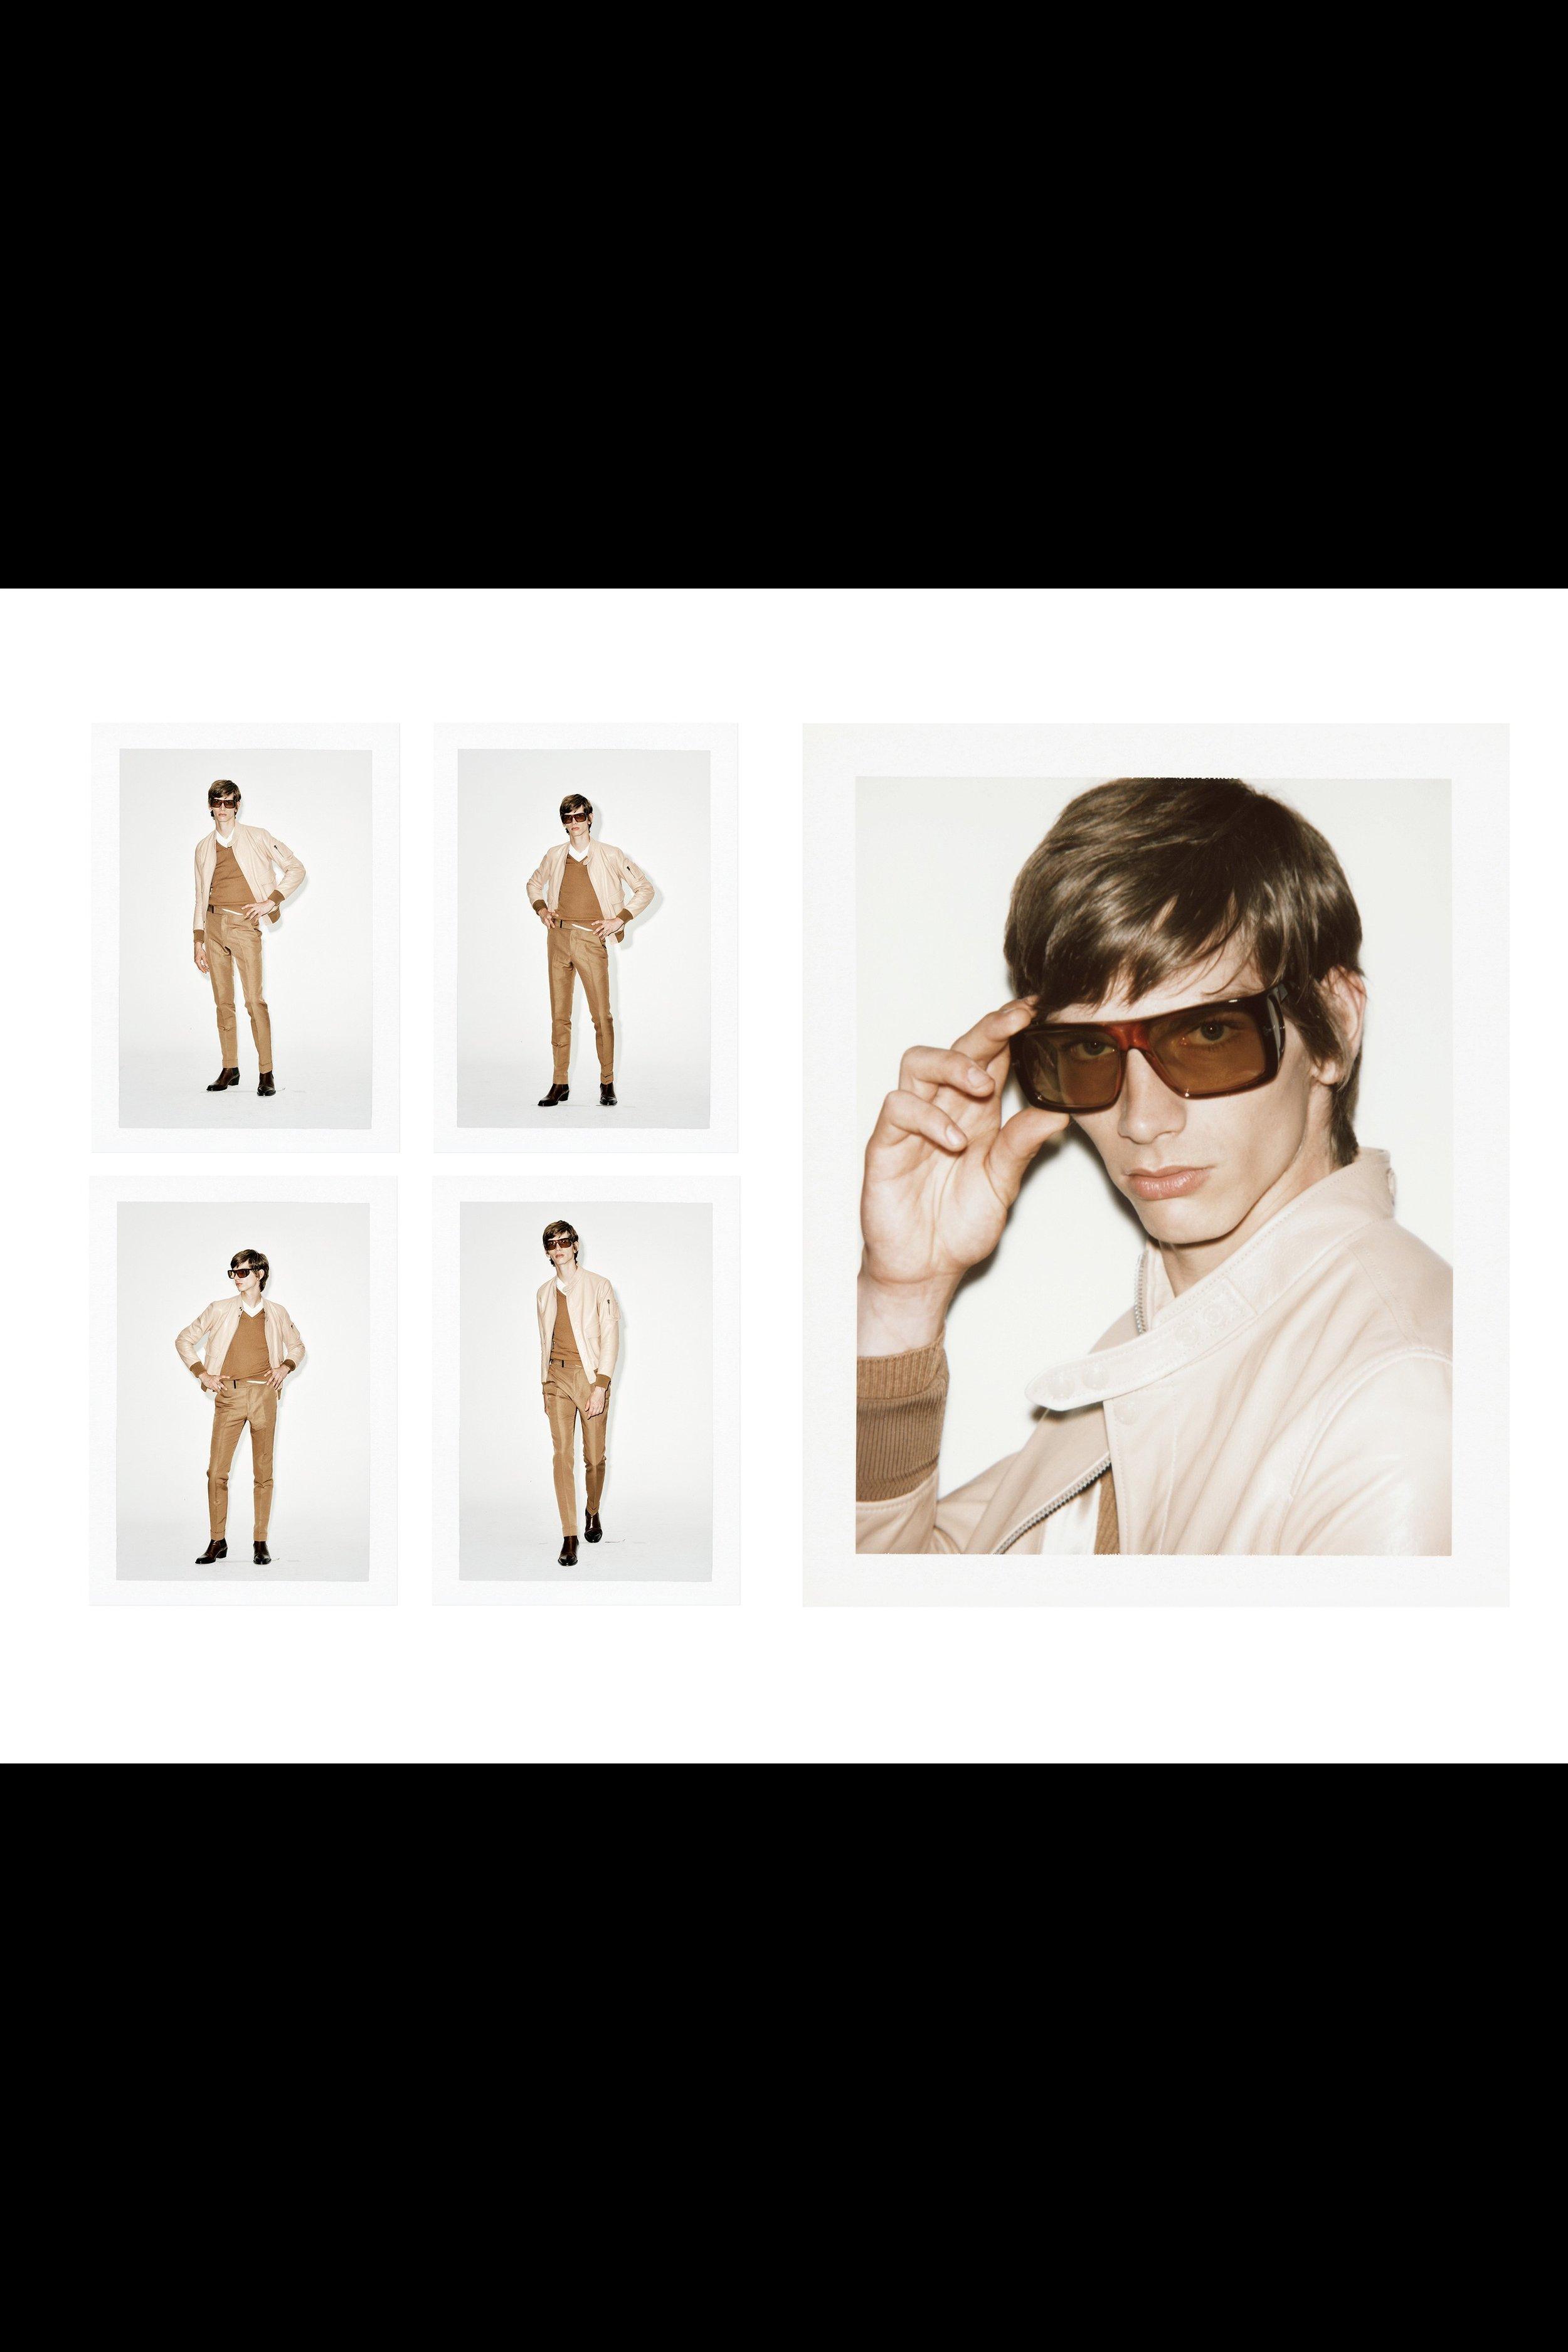 00027-Tom-Ford-vogue-menswear-spring-2019-pr.jpg